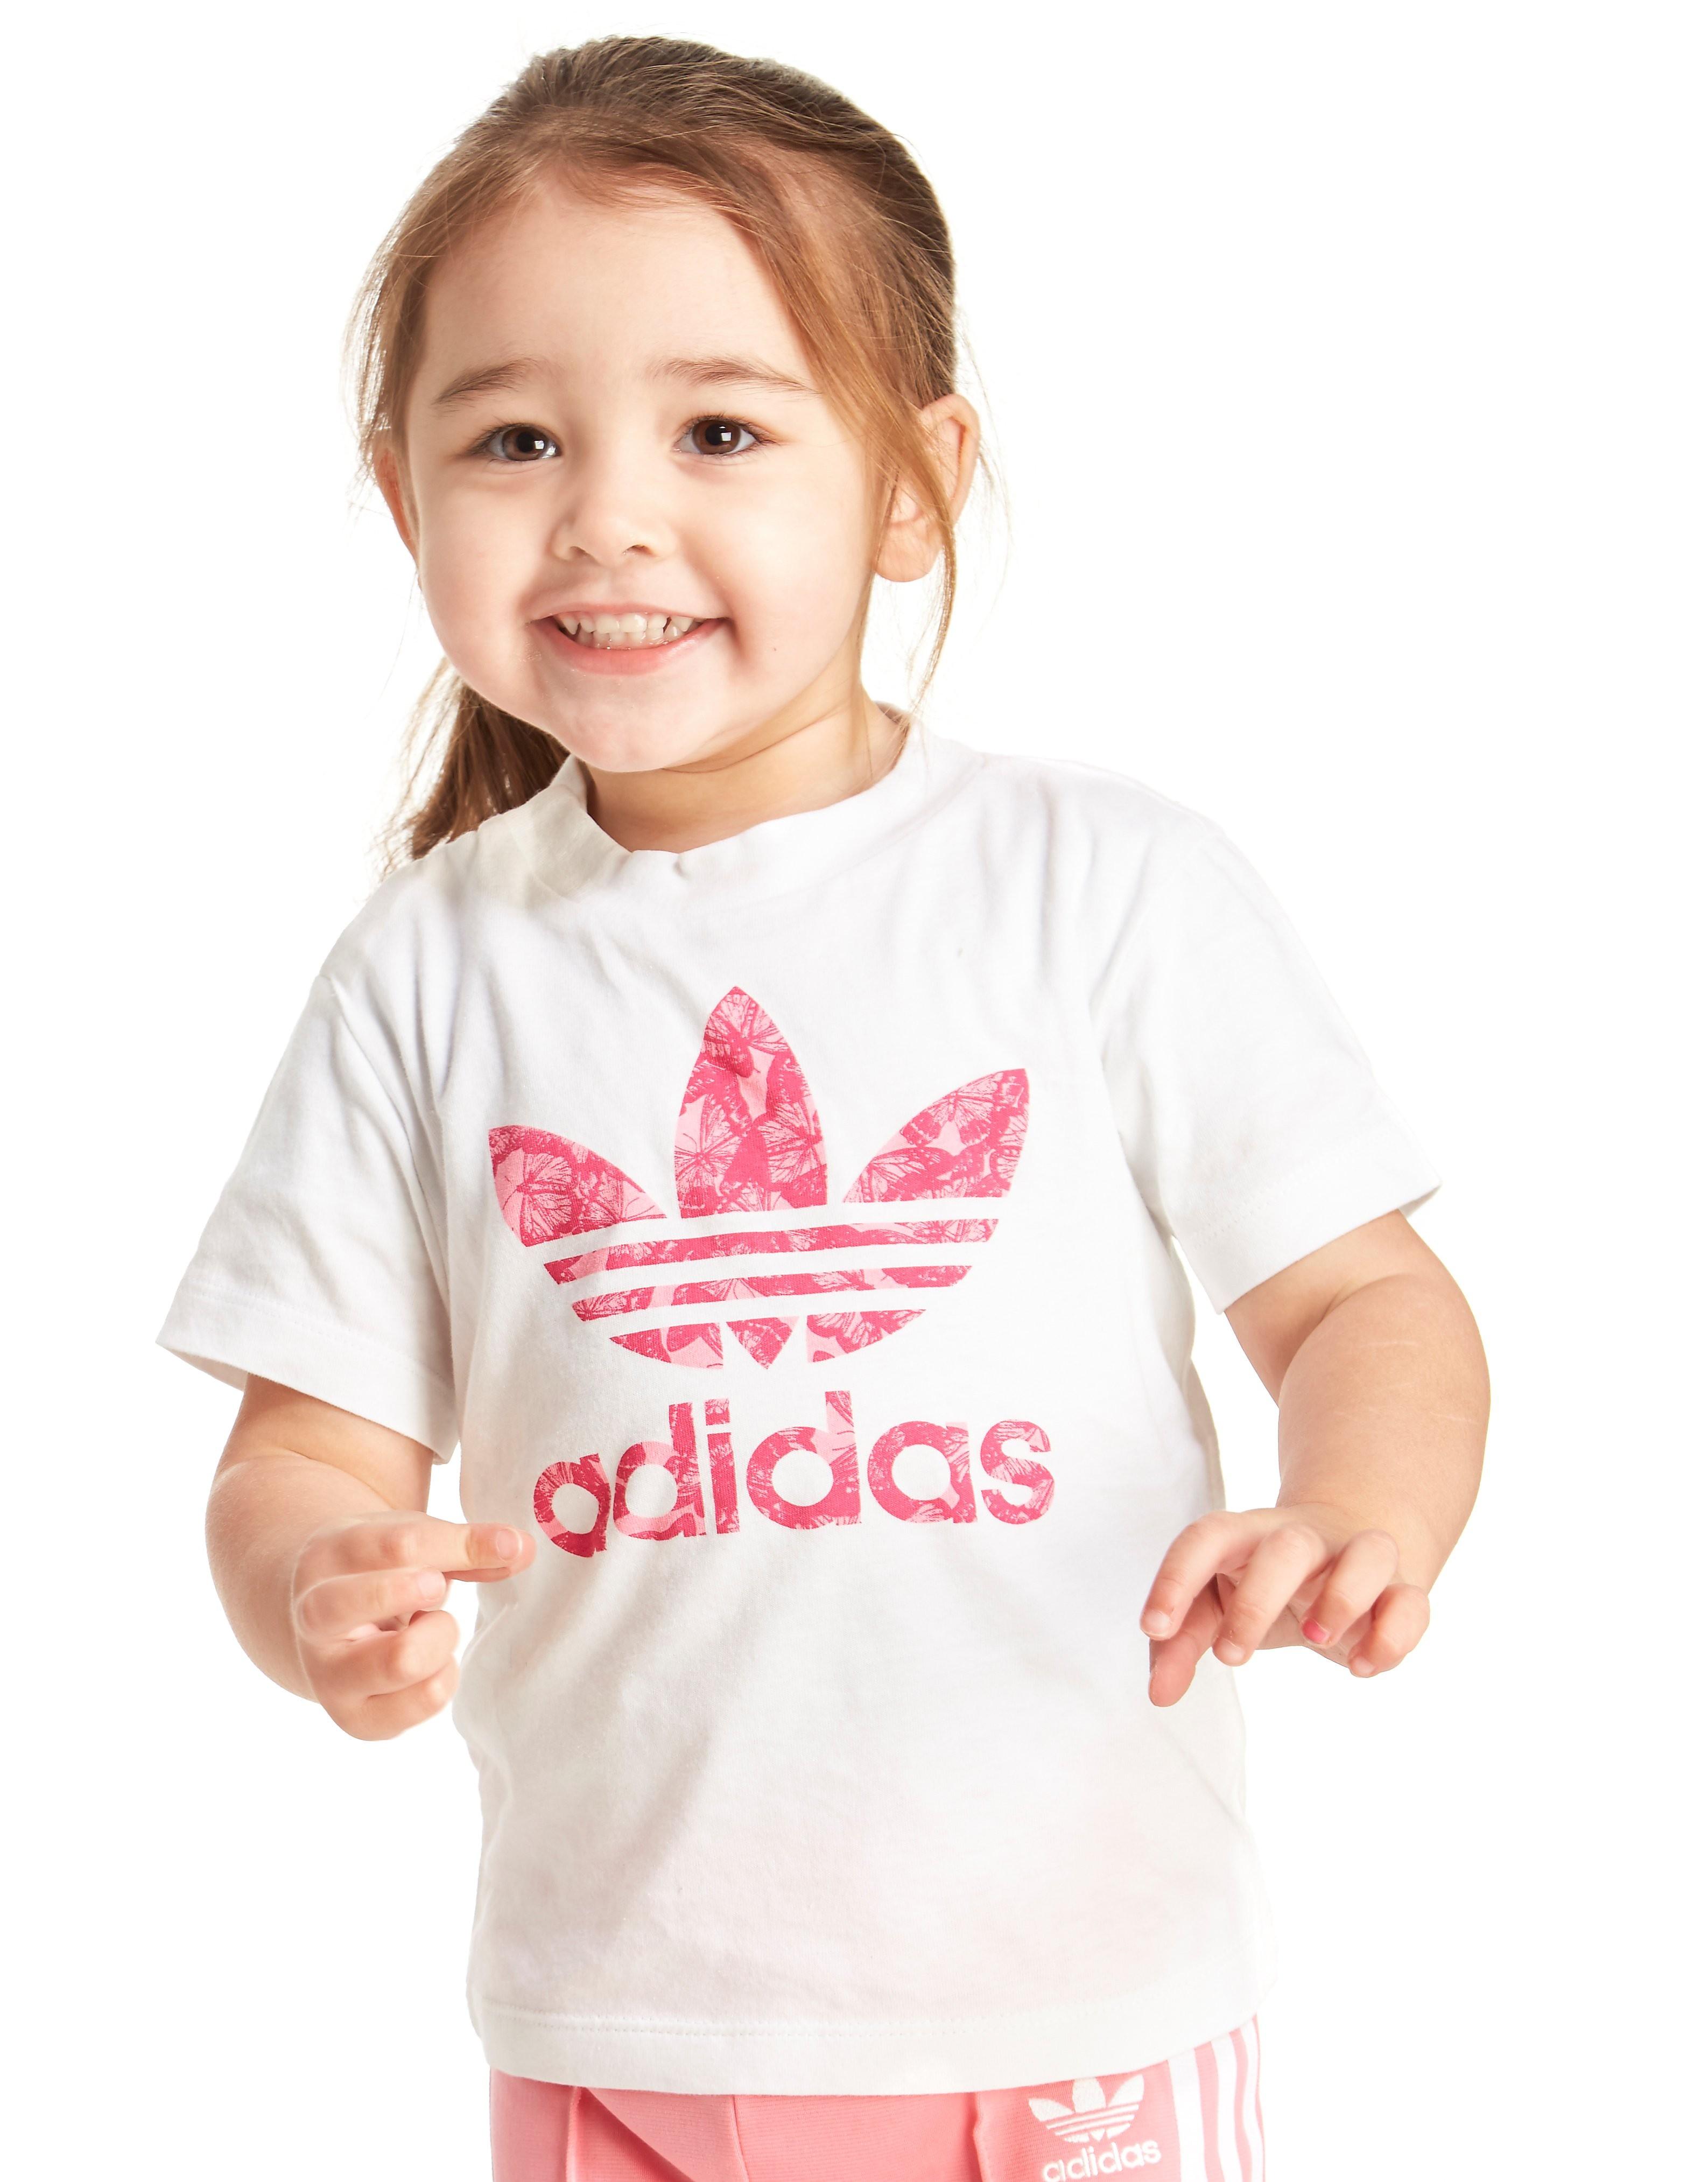 adidas Originals Mädchen-T-Shirt mit Kleeblatt-Logo im Flockdruck